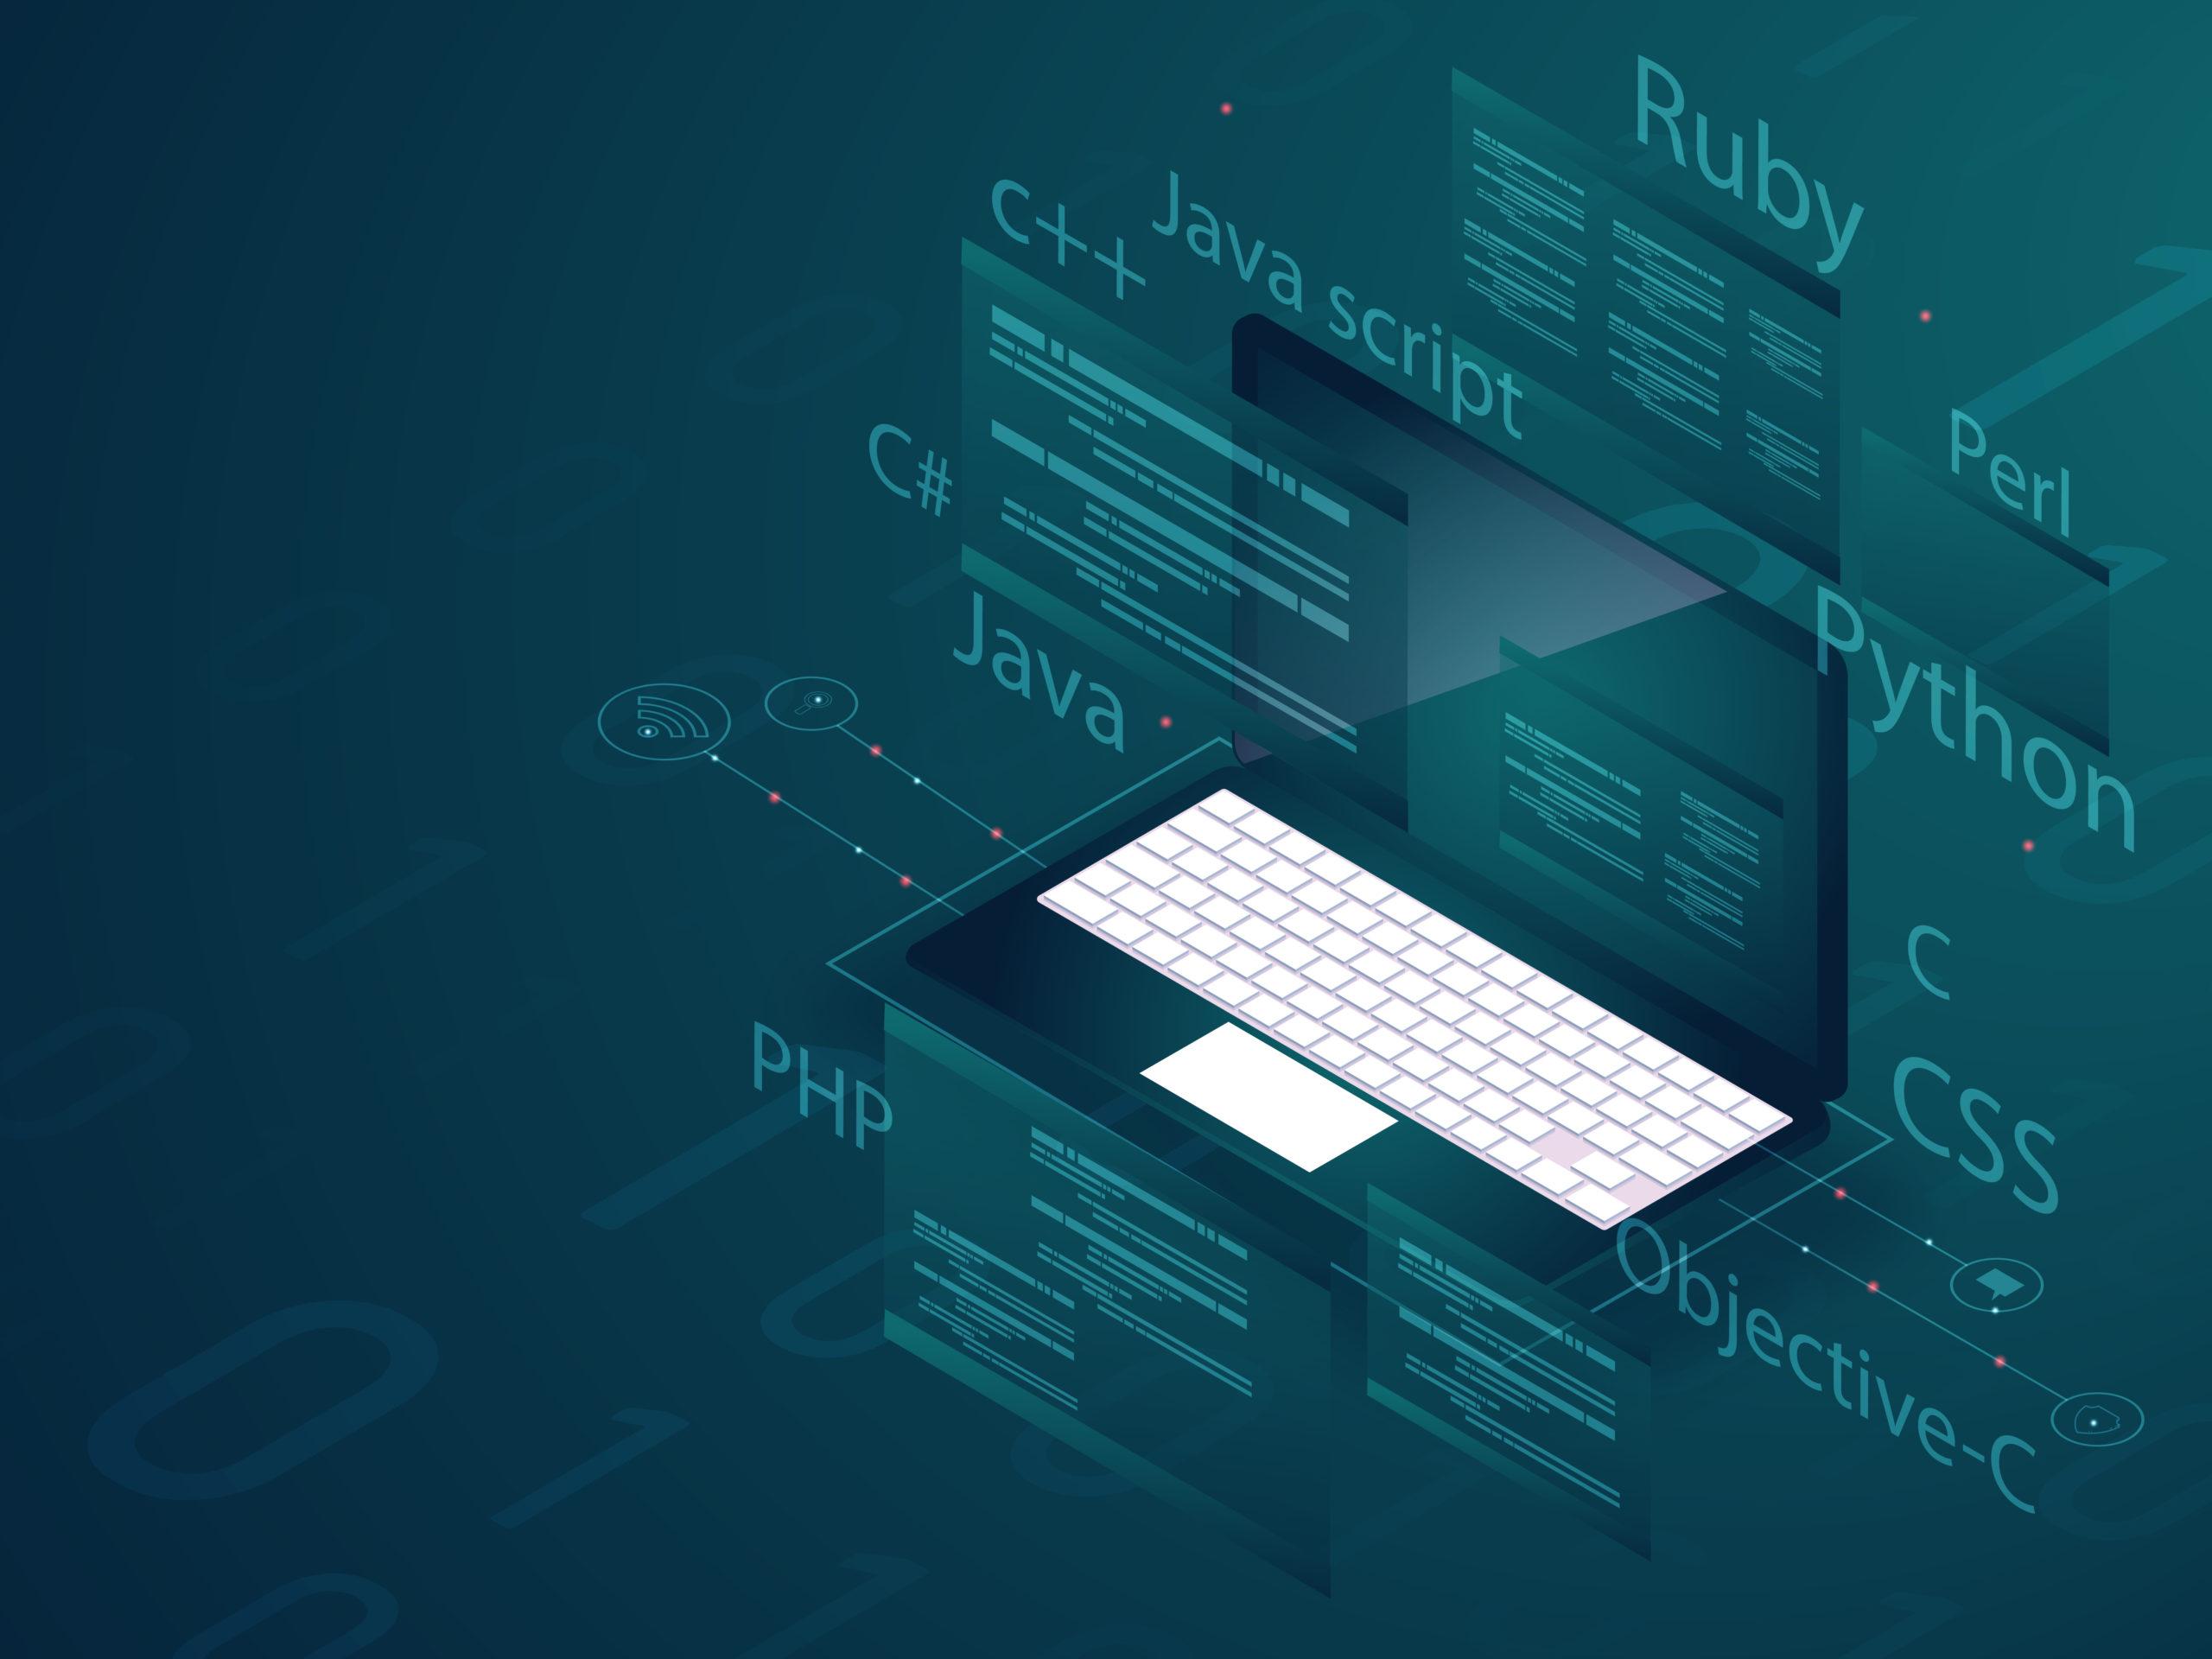 Software development programming concept. Isometric illustration of laptop with multiple programming language on green matrix coding background.